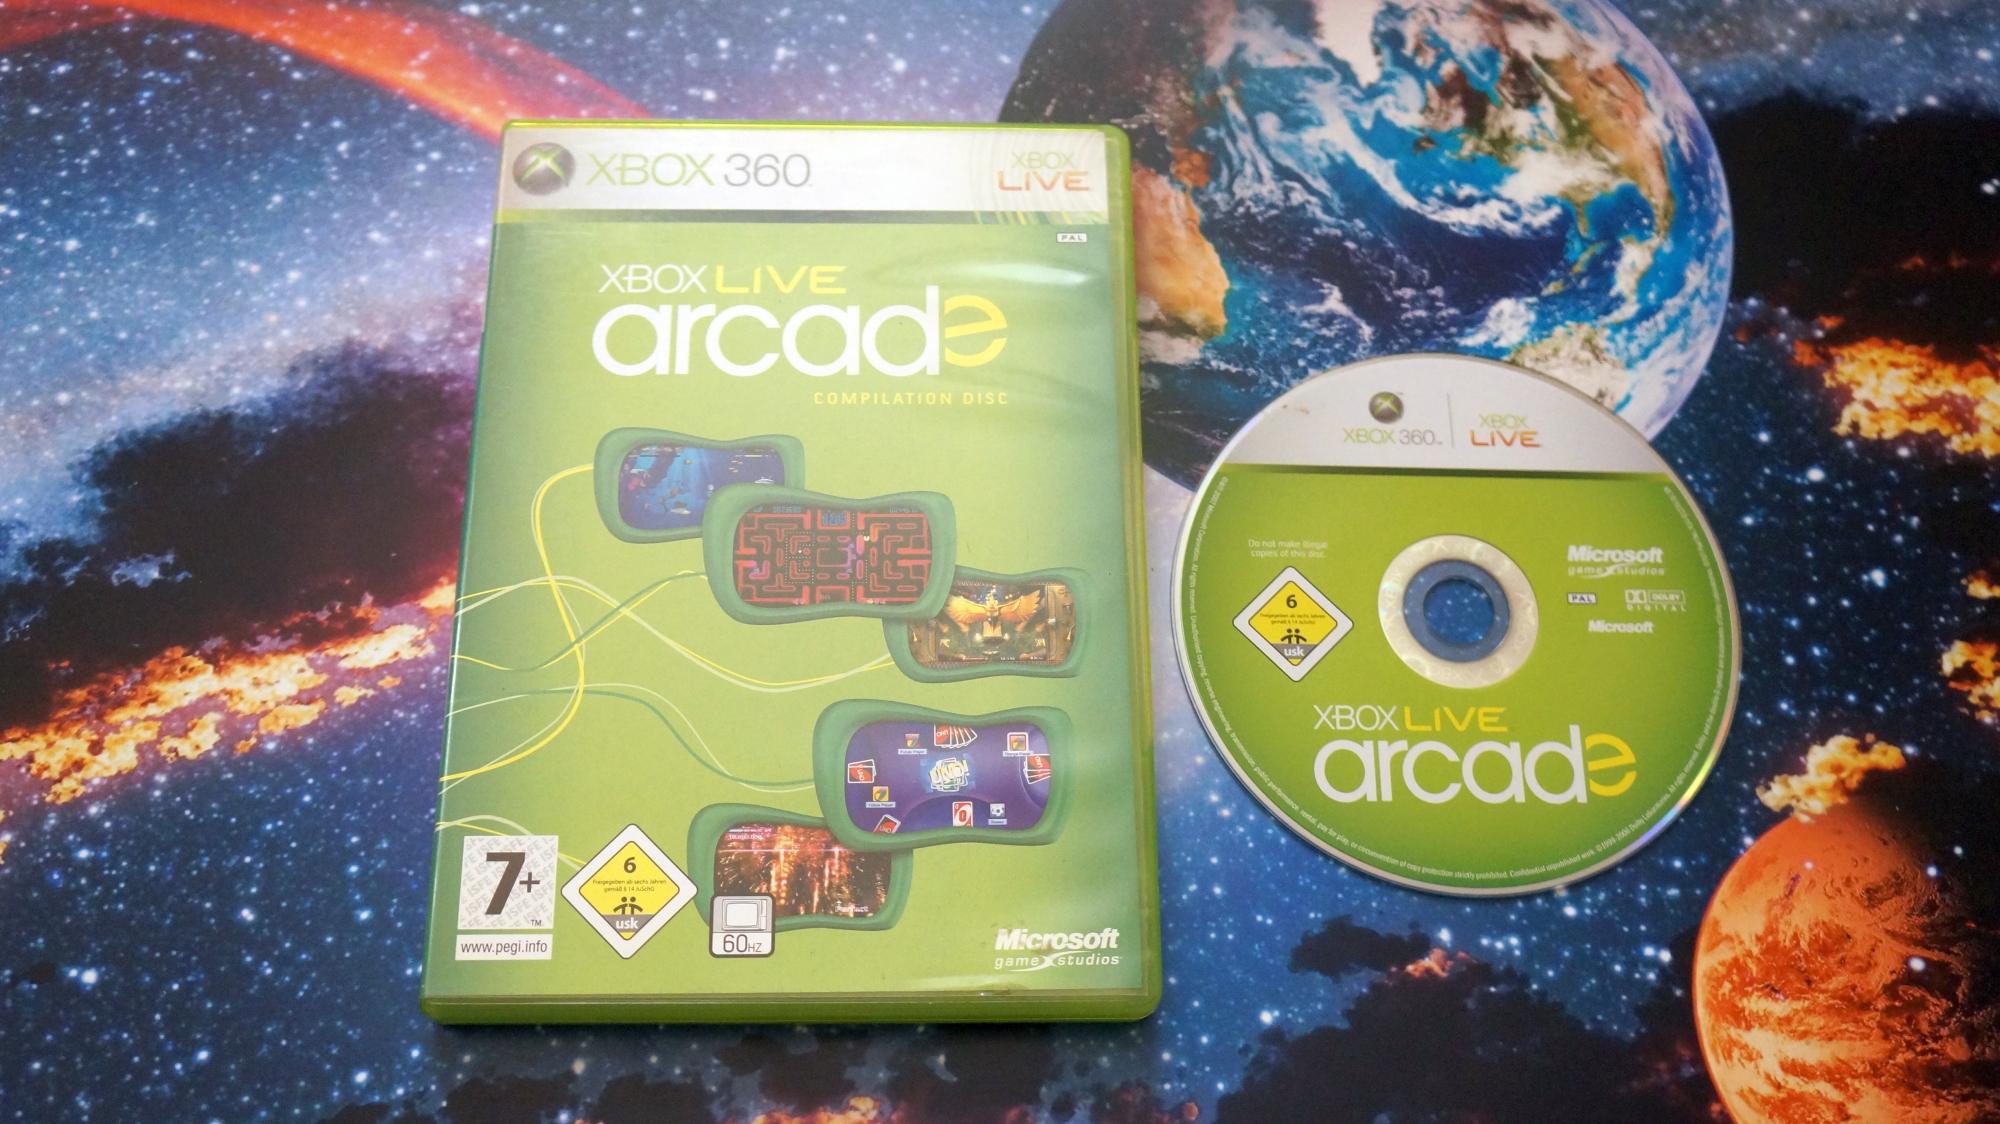 Игра для Luxor 2 фото коробки и диска Xbox Live Arcade Compilation disc